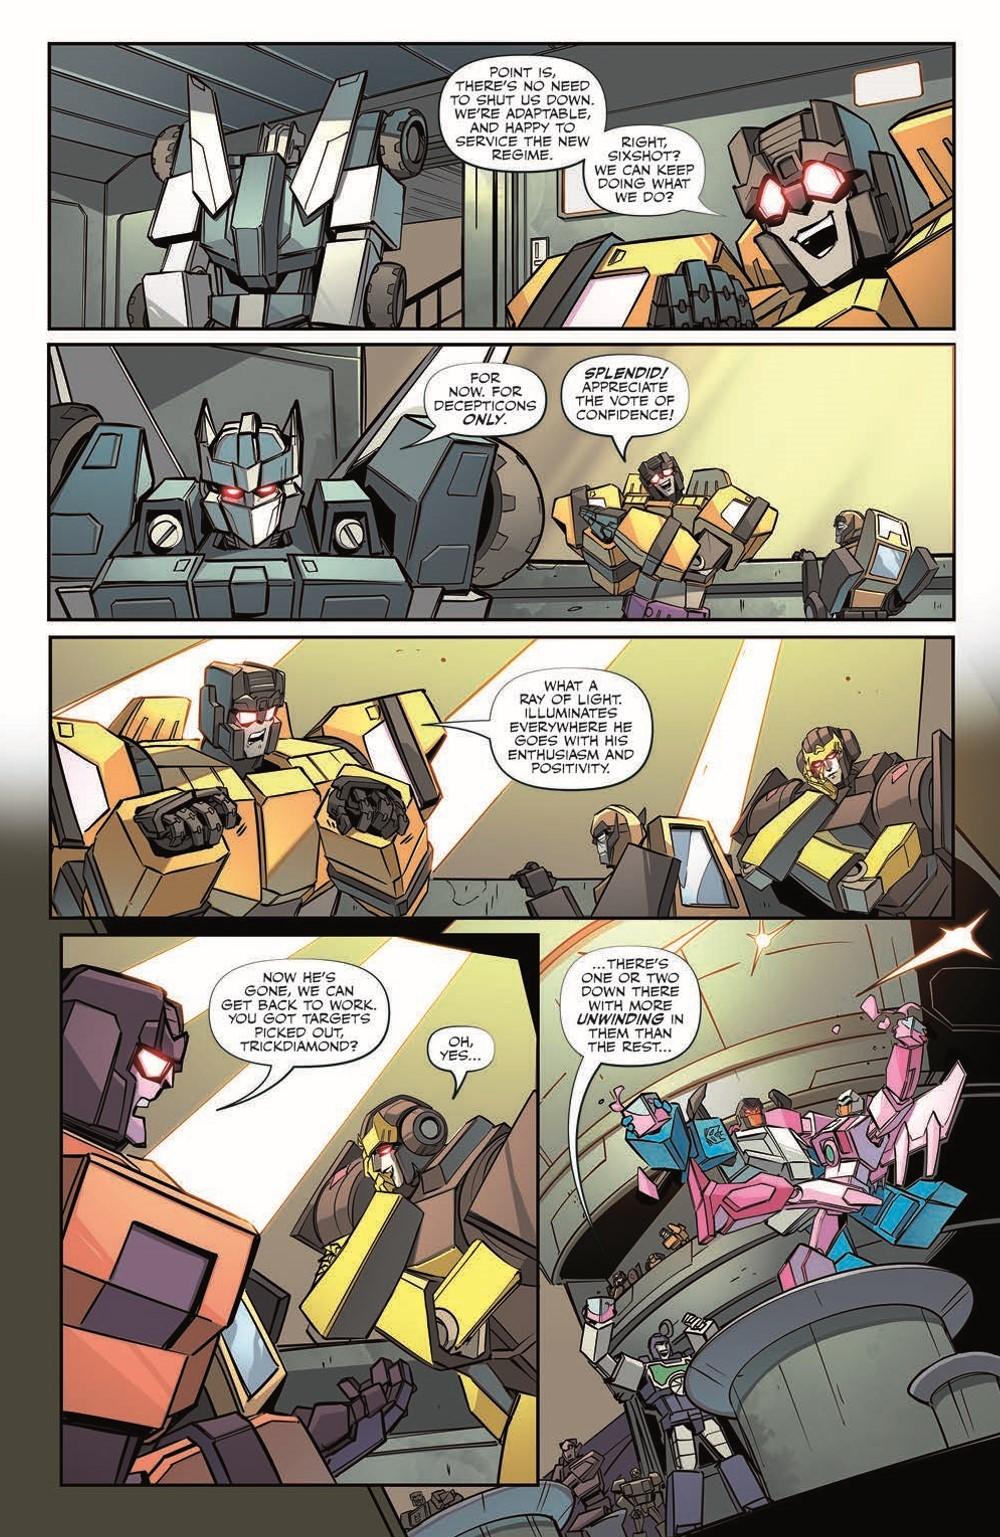 TF33-pr-5 ComicList Previews: TRANSFORMERS #33